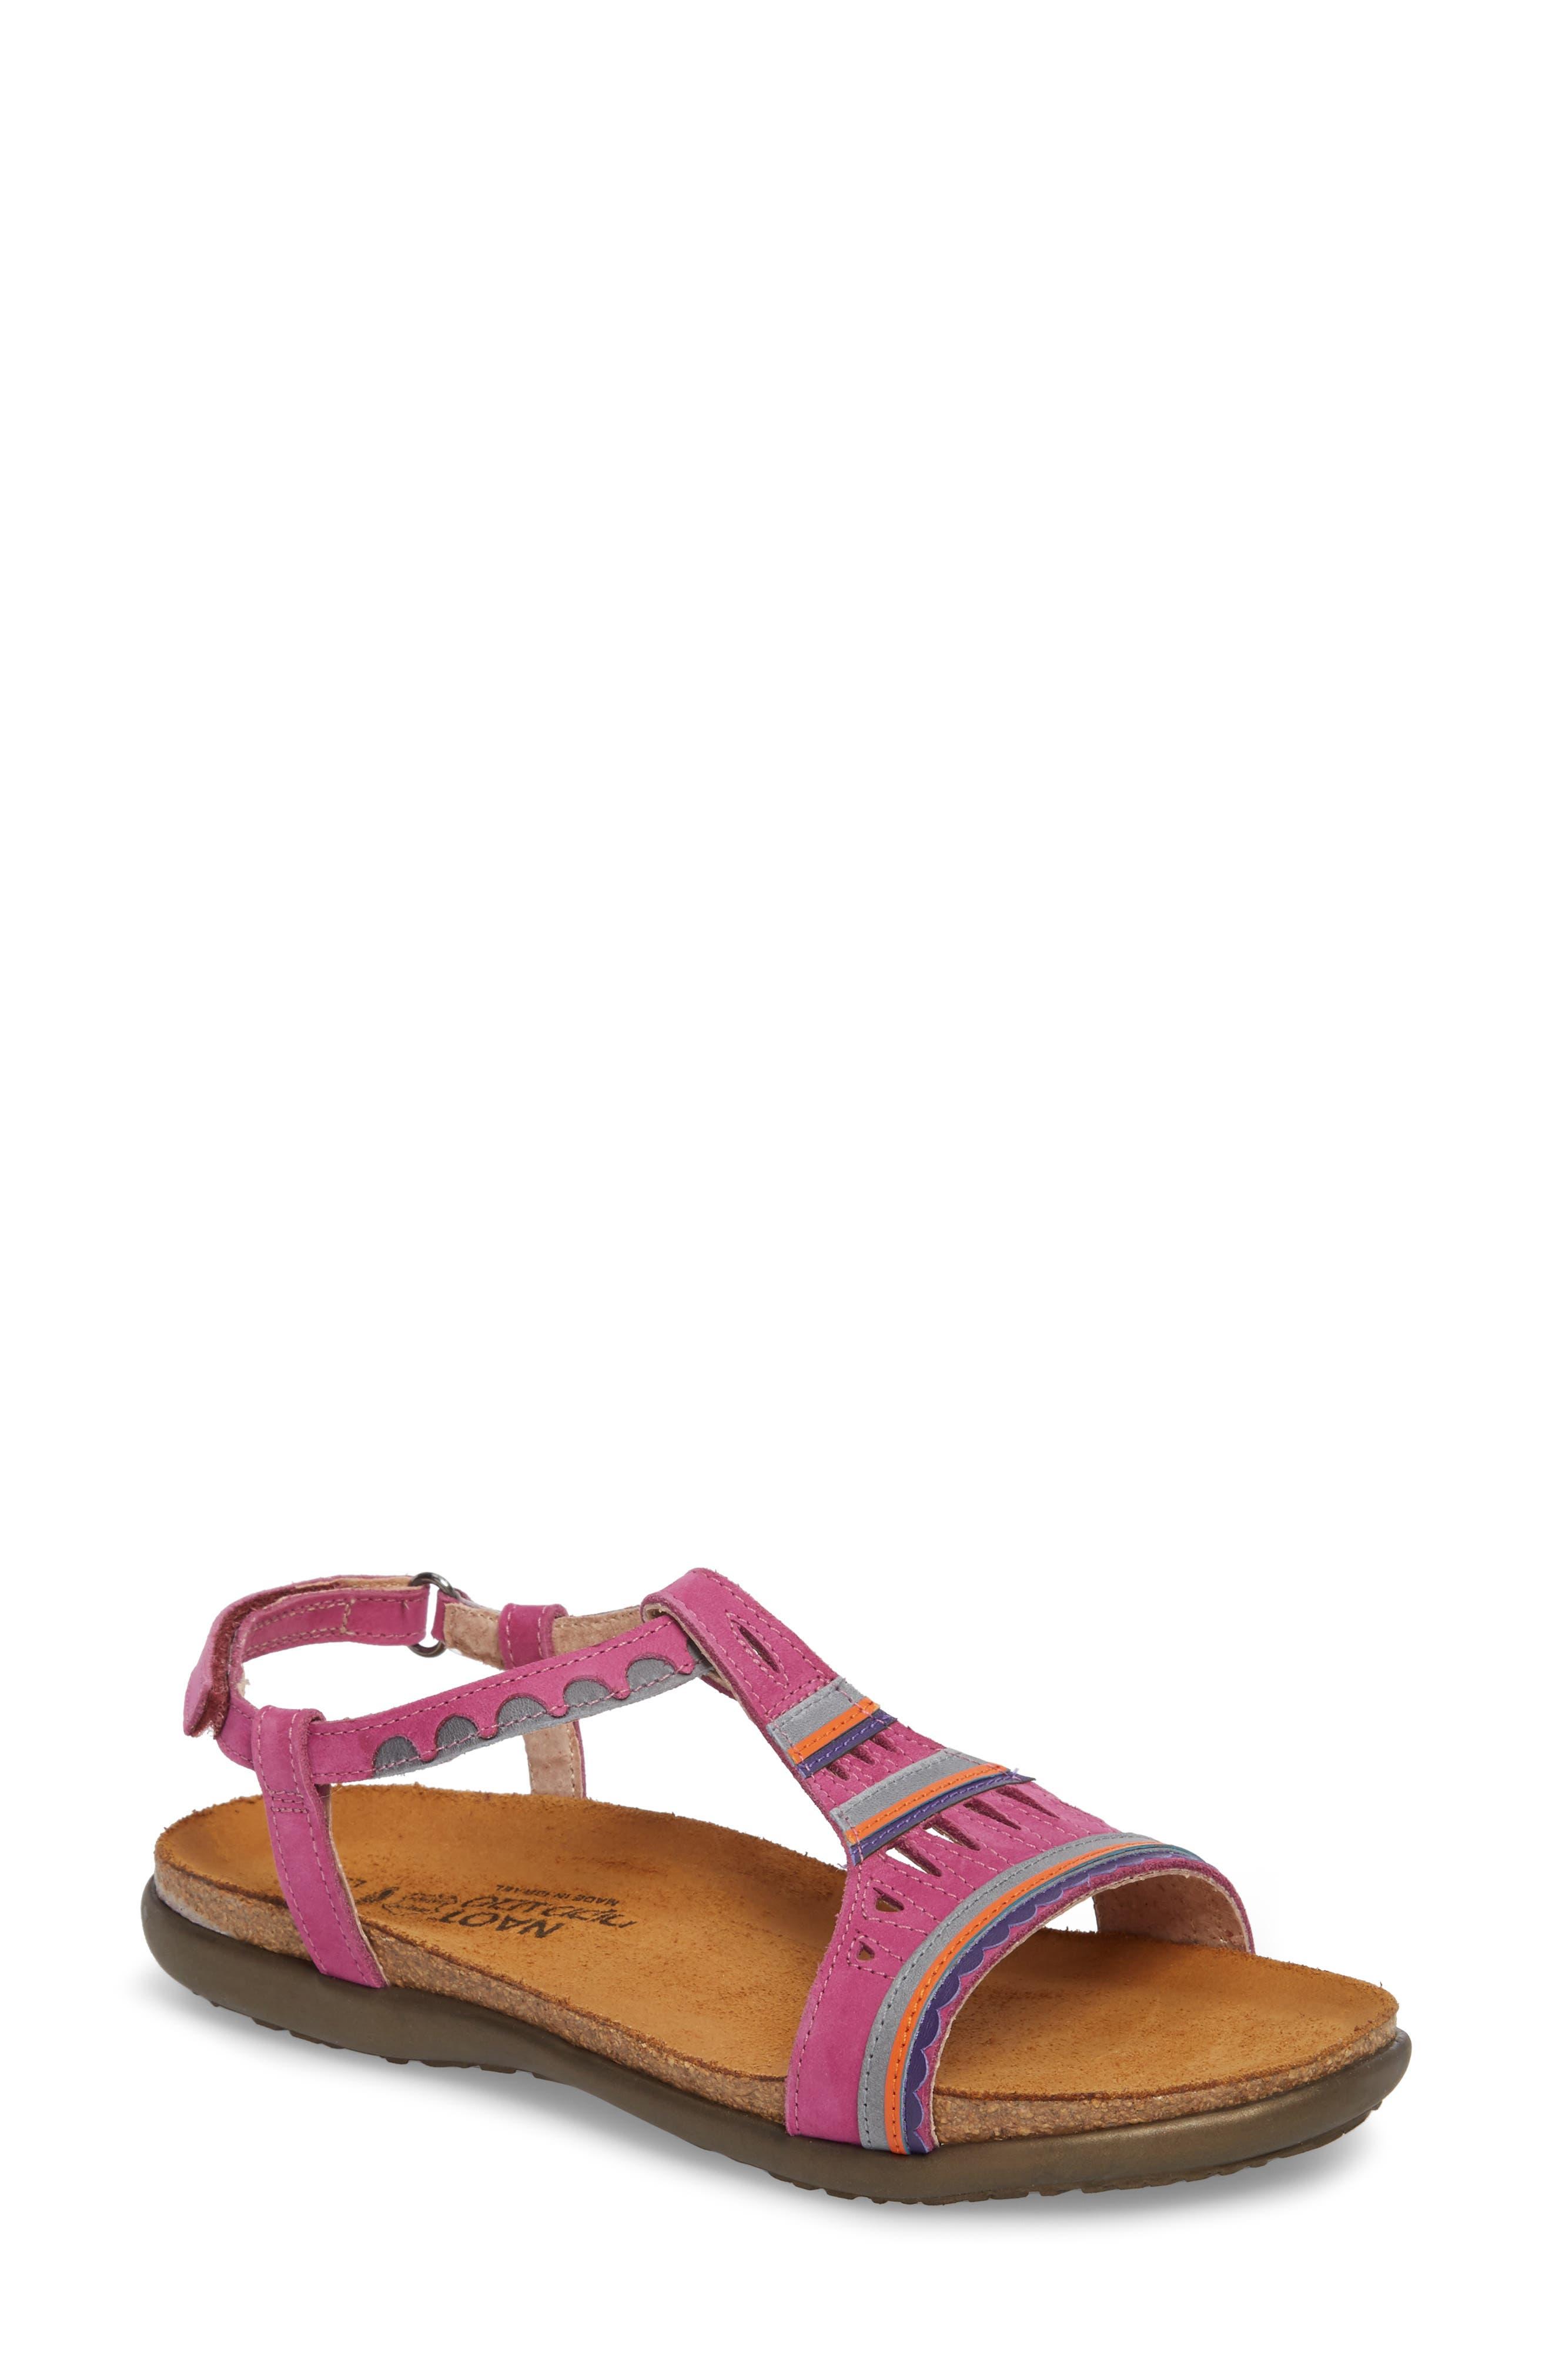 NAOT Odelia Perforated T-Strap Sandal, Main, color, PINK PLUM NUBUCK